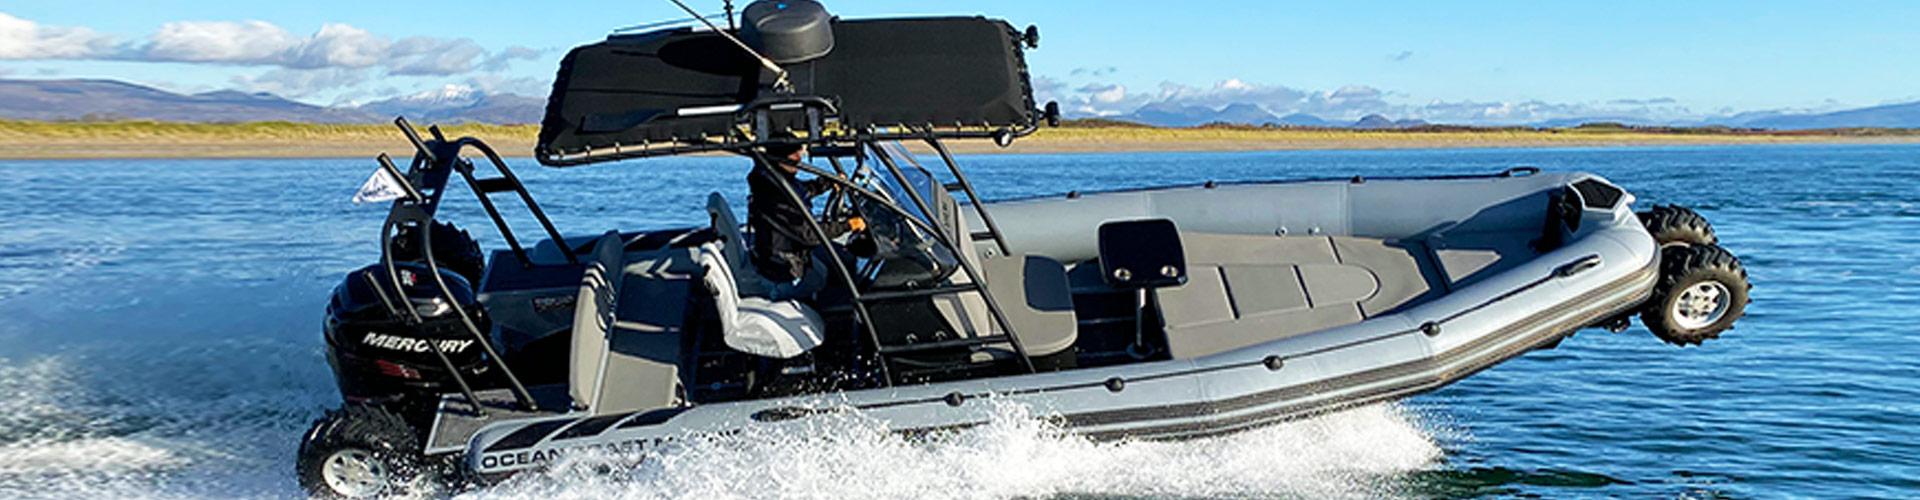 8.4m OCM Amphibious boat